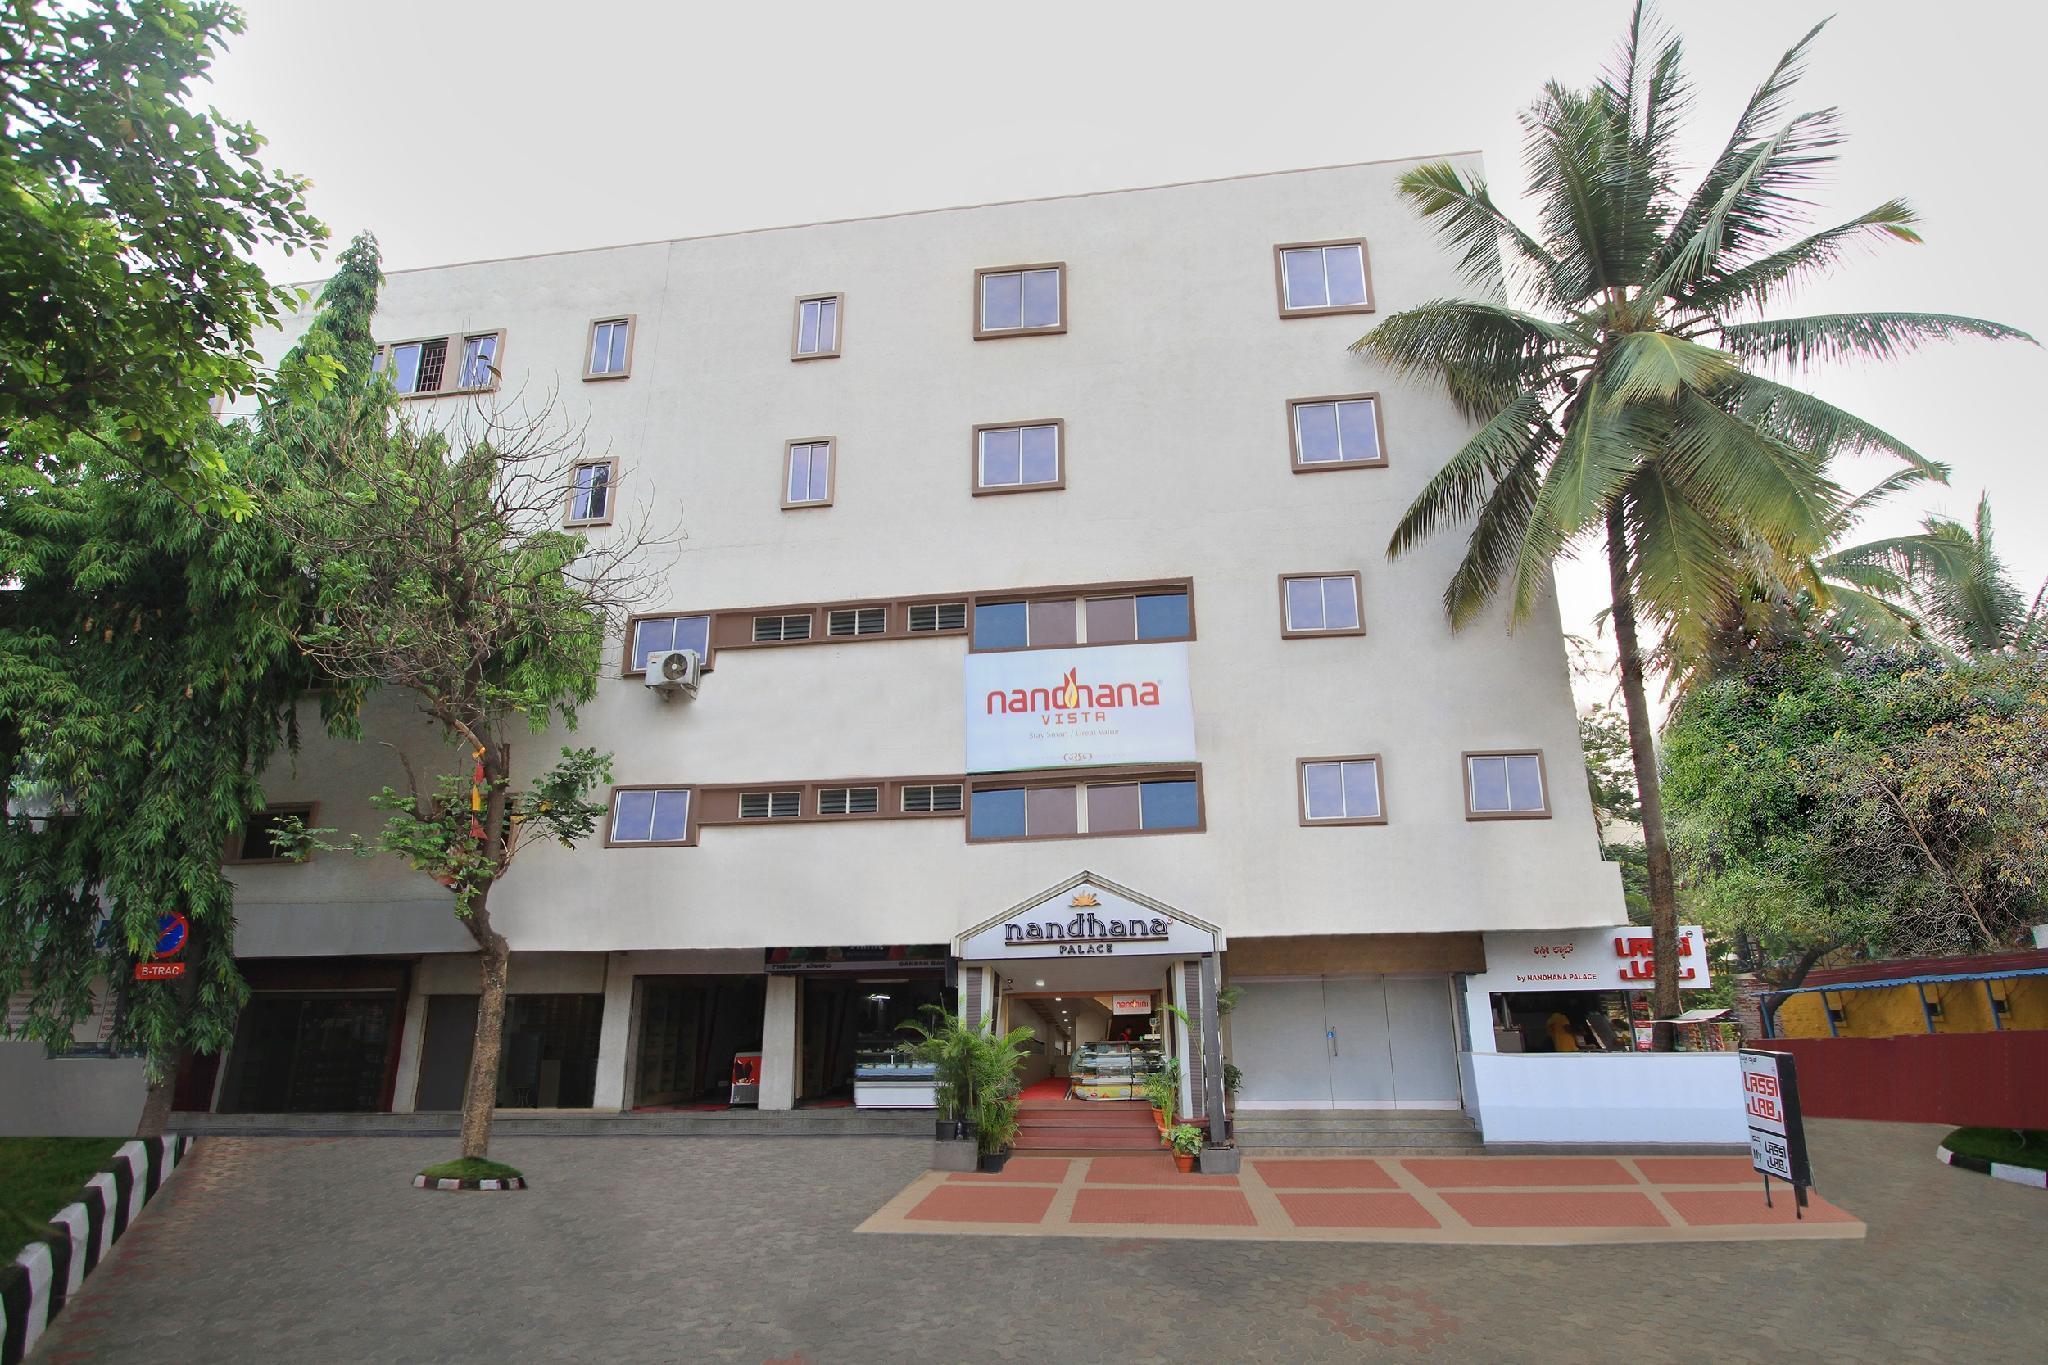 Hotel Nandhana Vista